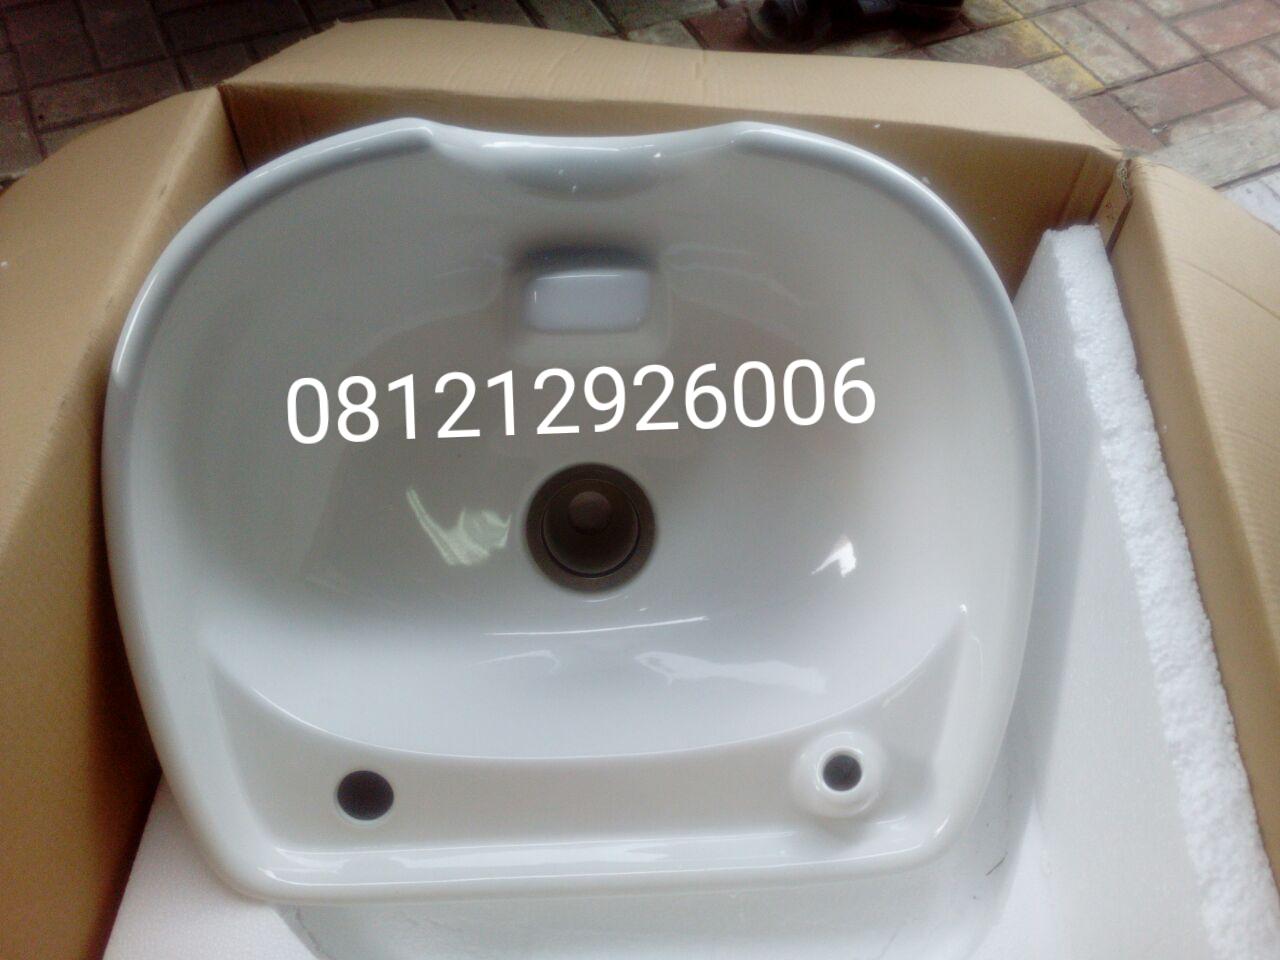 Washbax Keramik